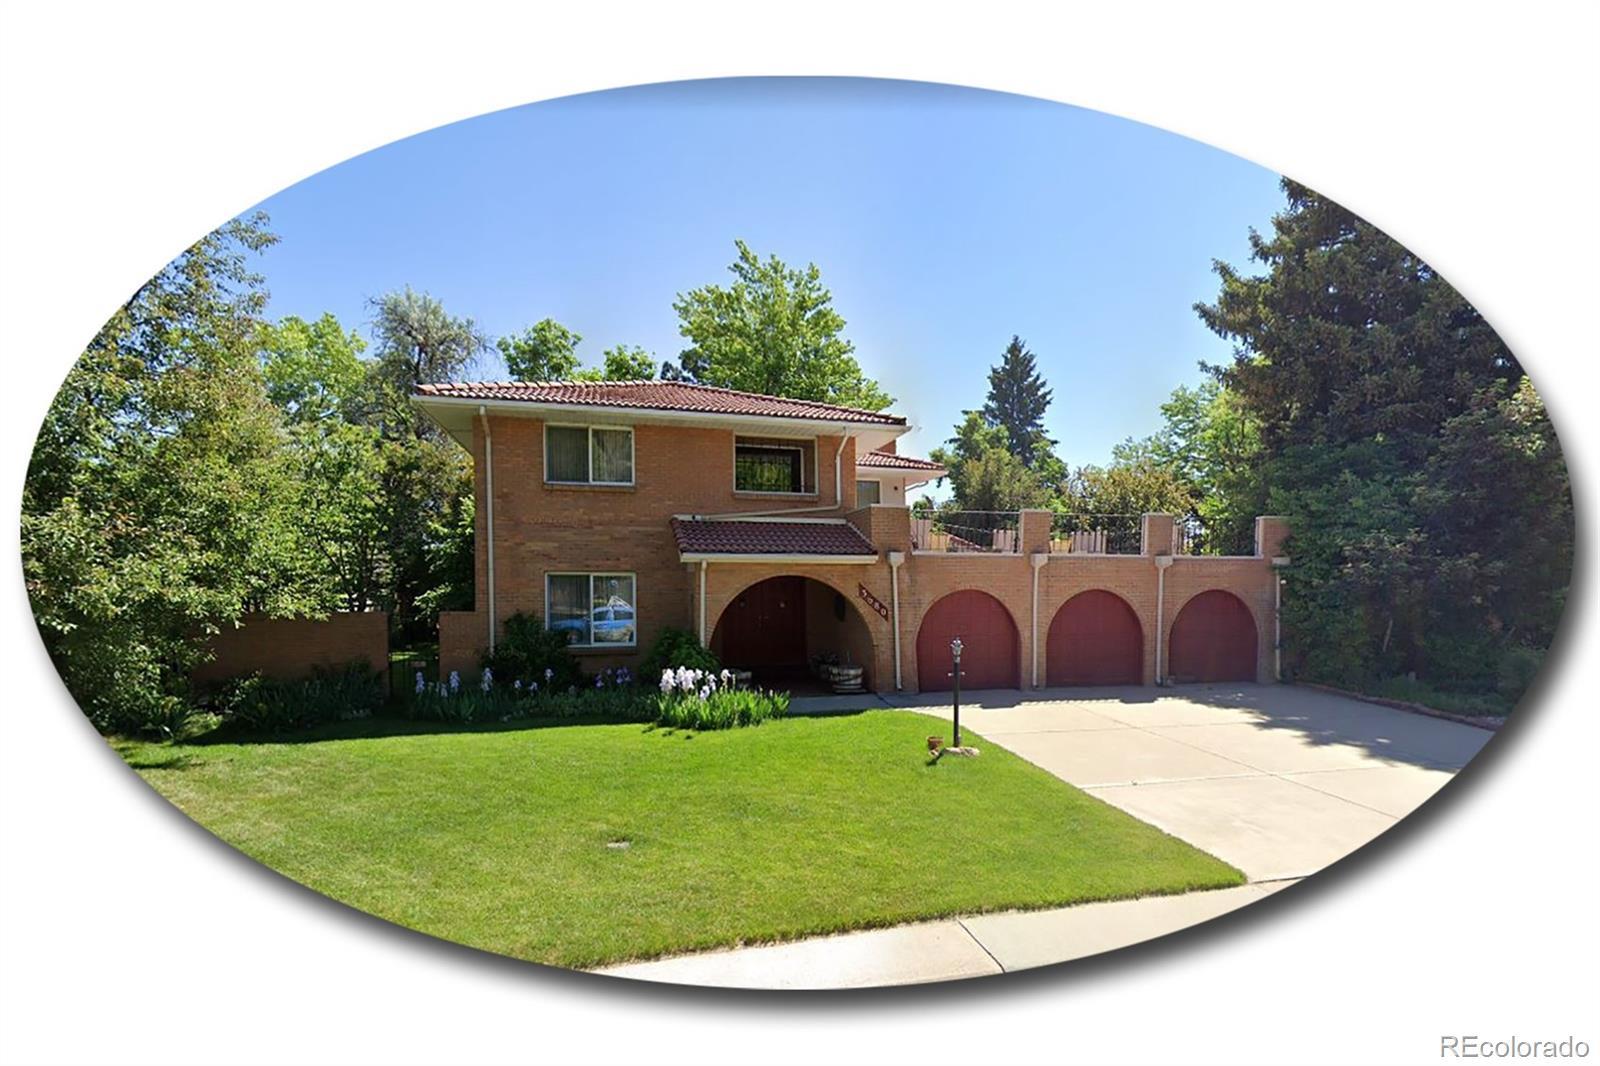 MLS# 8064666 - 1 - 3680 S Hillcrest Drive, Denver, CO 80237